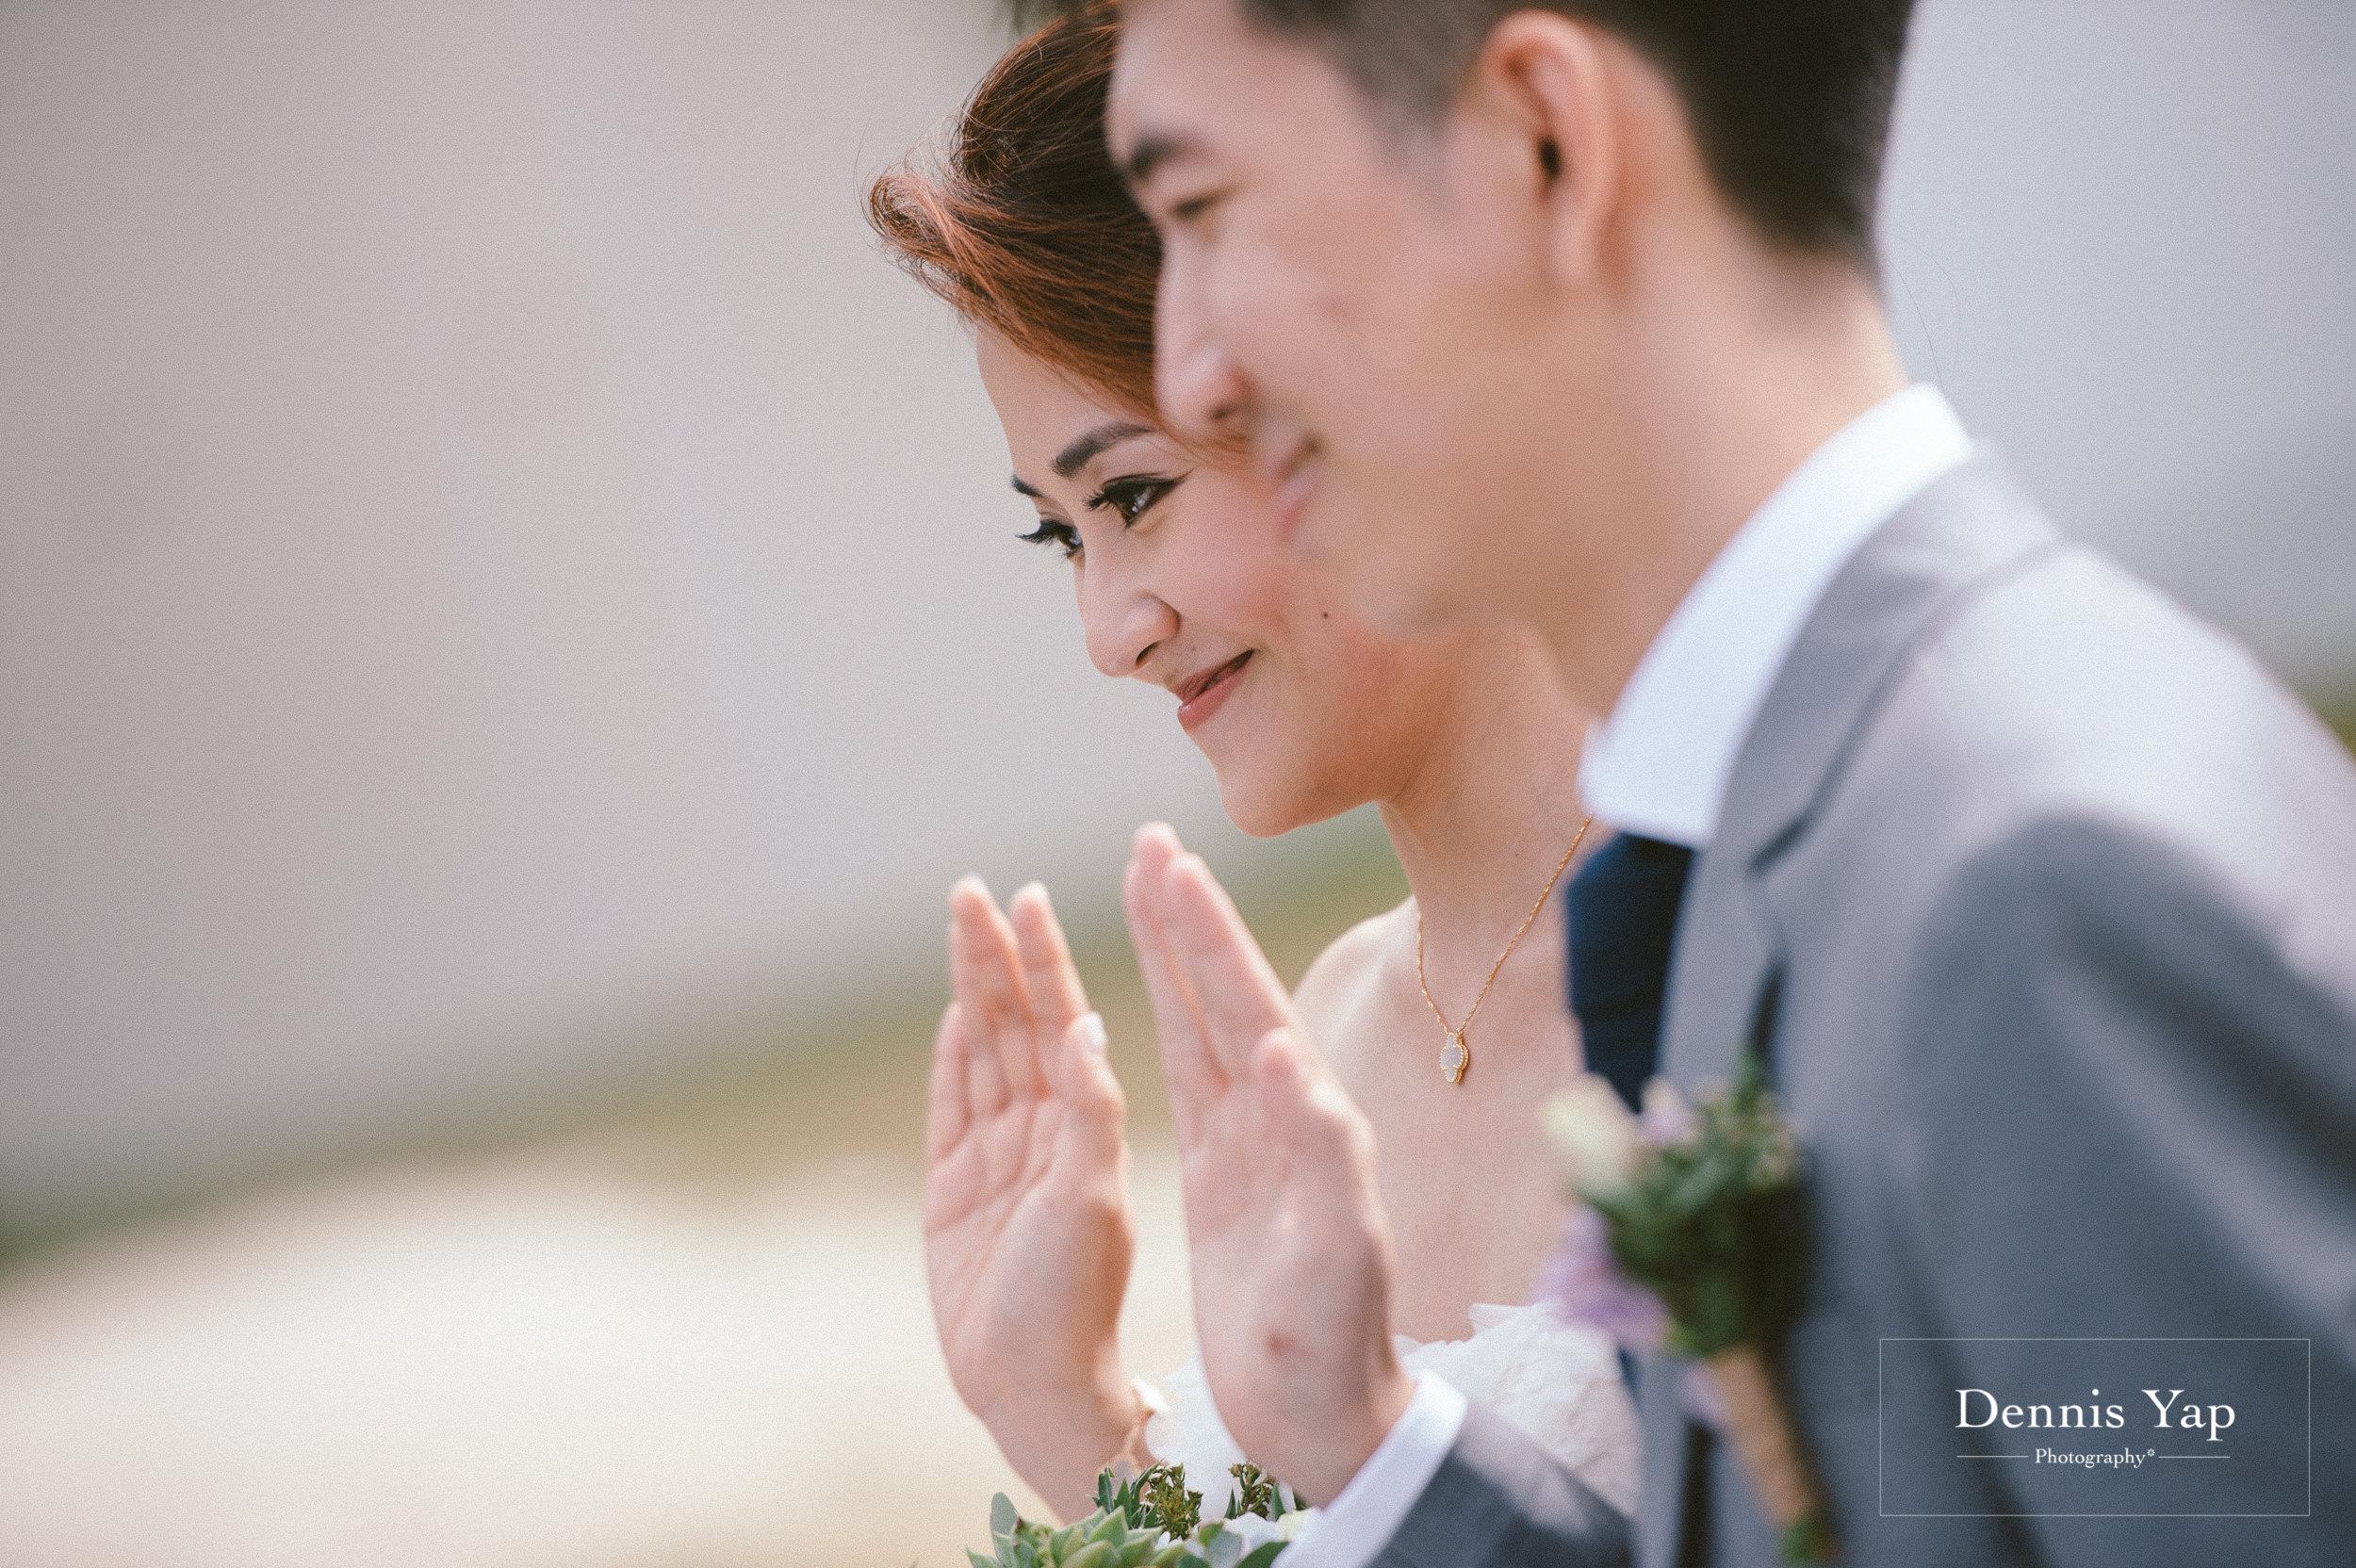 jamie hann wedding day gate crash garden wedding dennis yap photography traditional chinese tea ceremony-31.jpg